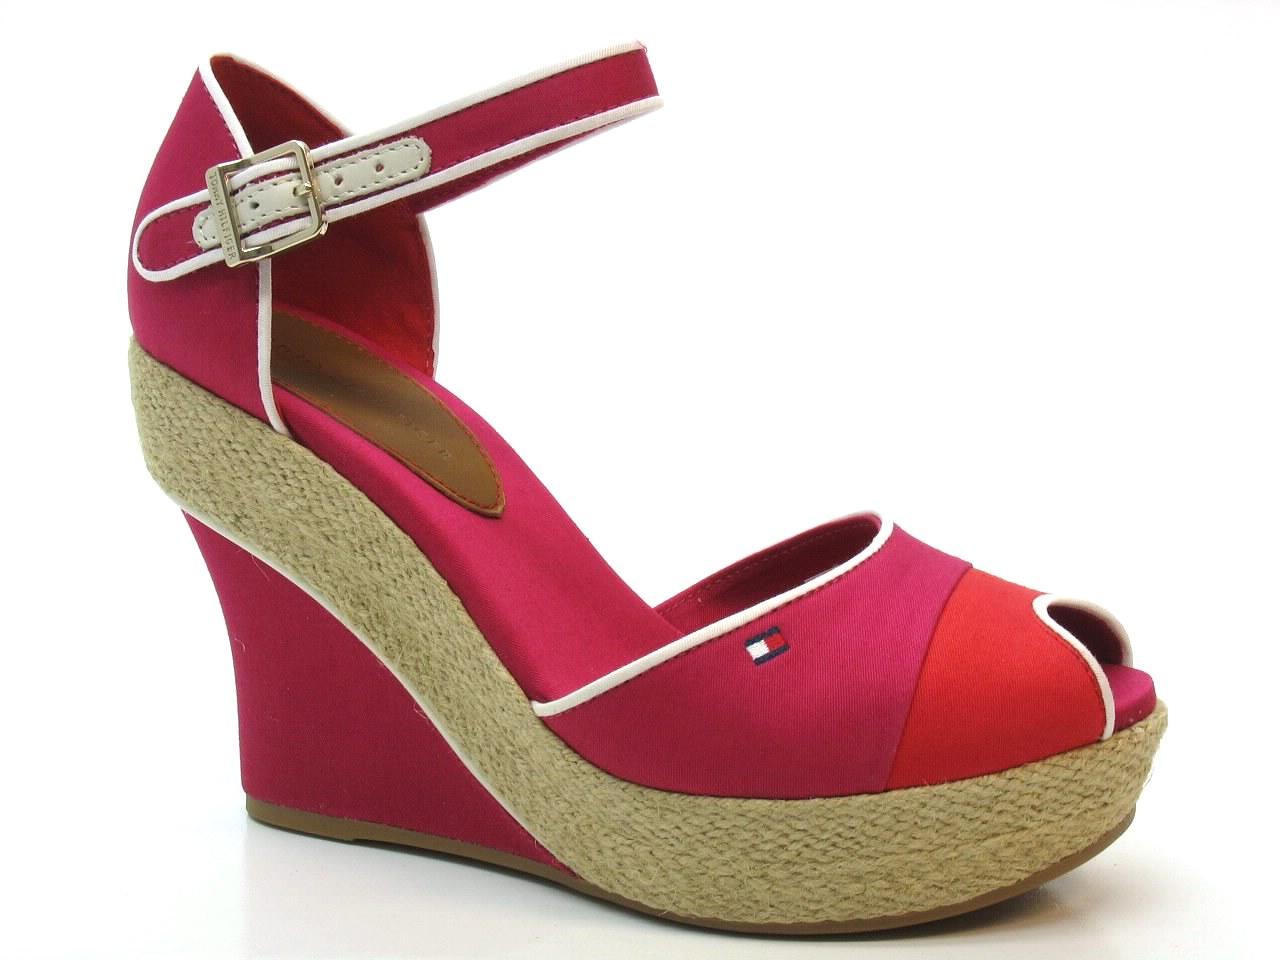 Wedge Sandals Tommy Hilfiger - 309 16786